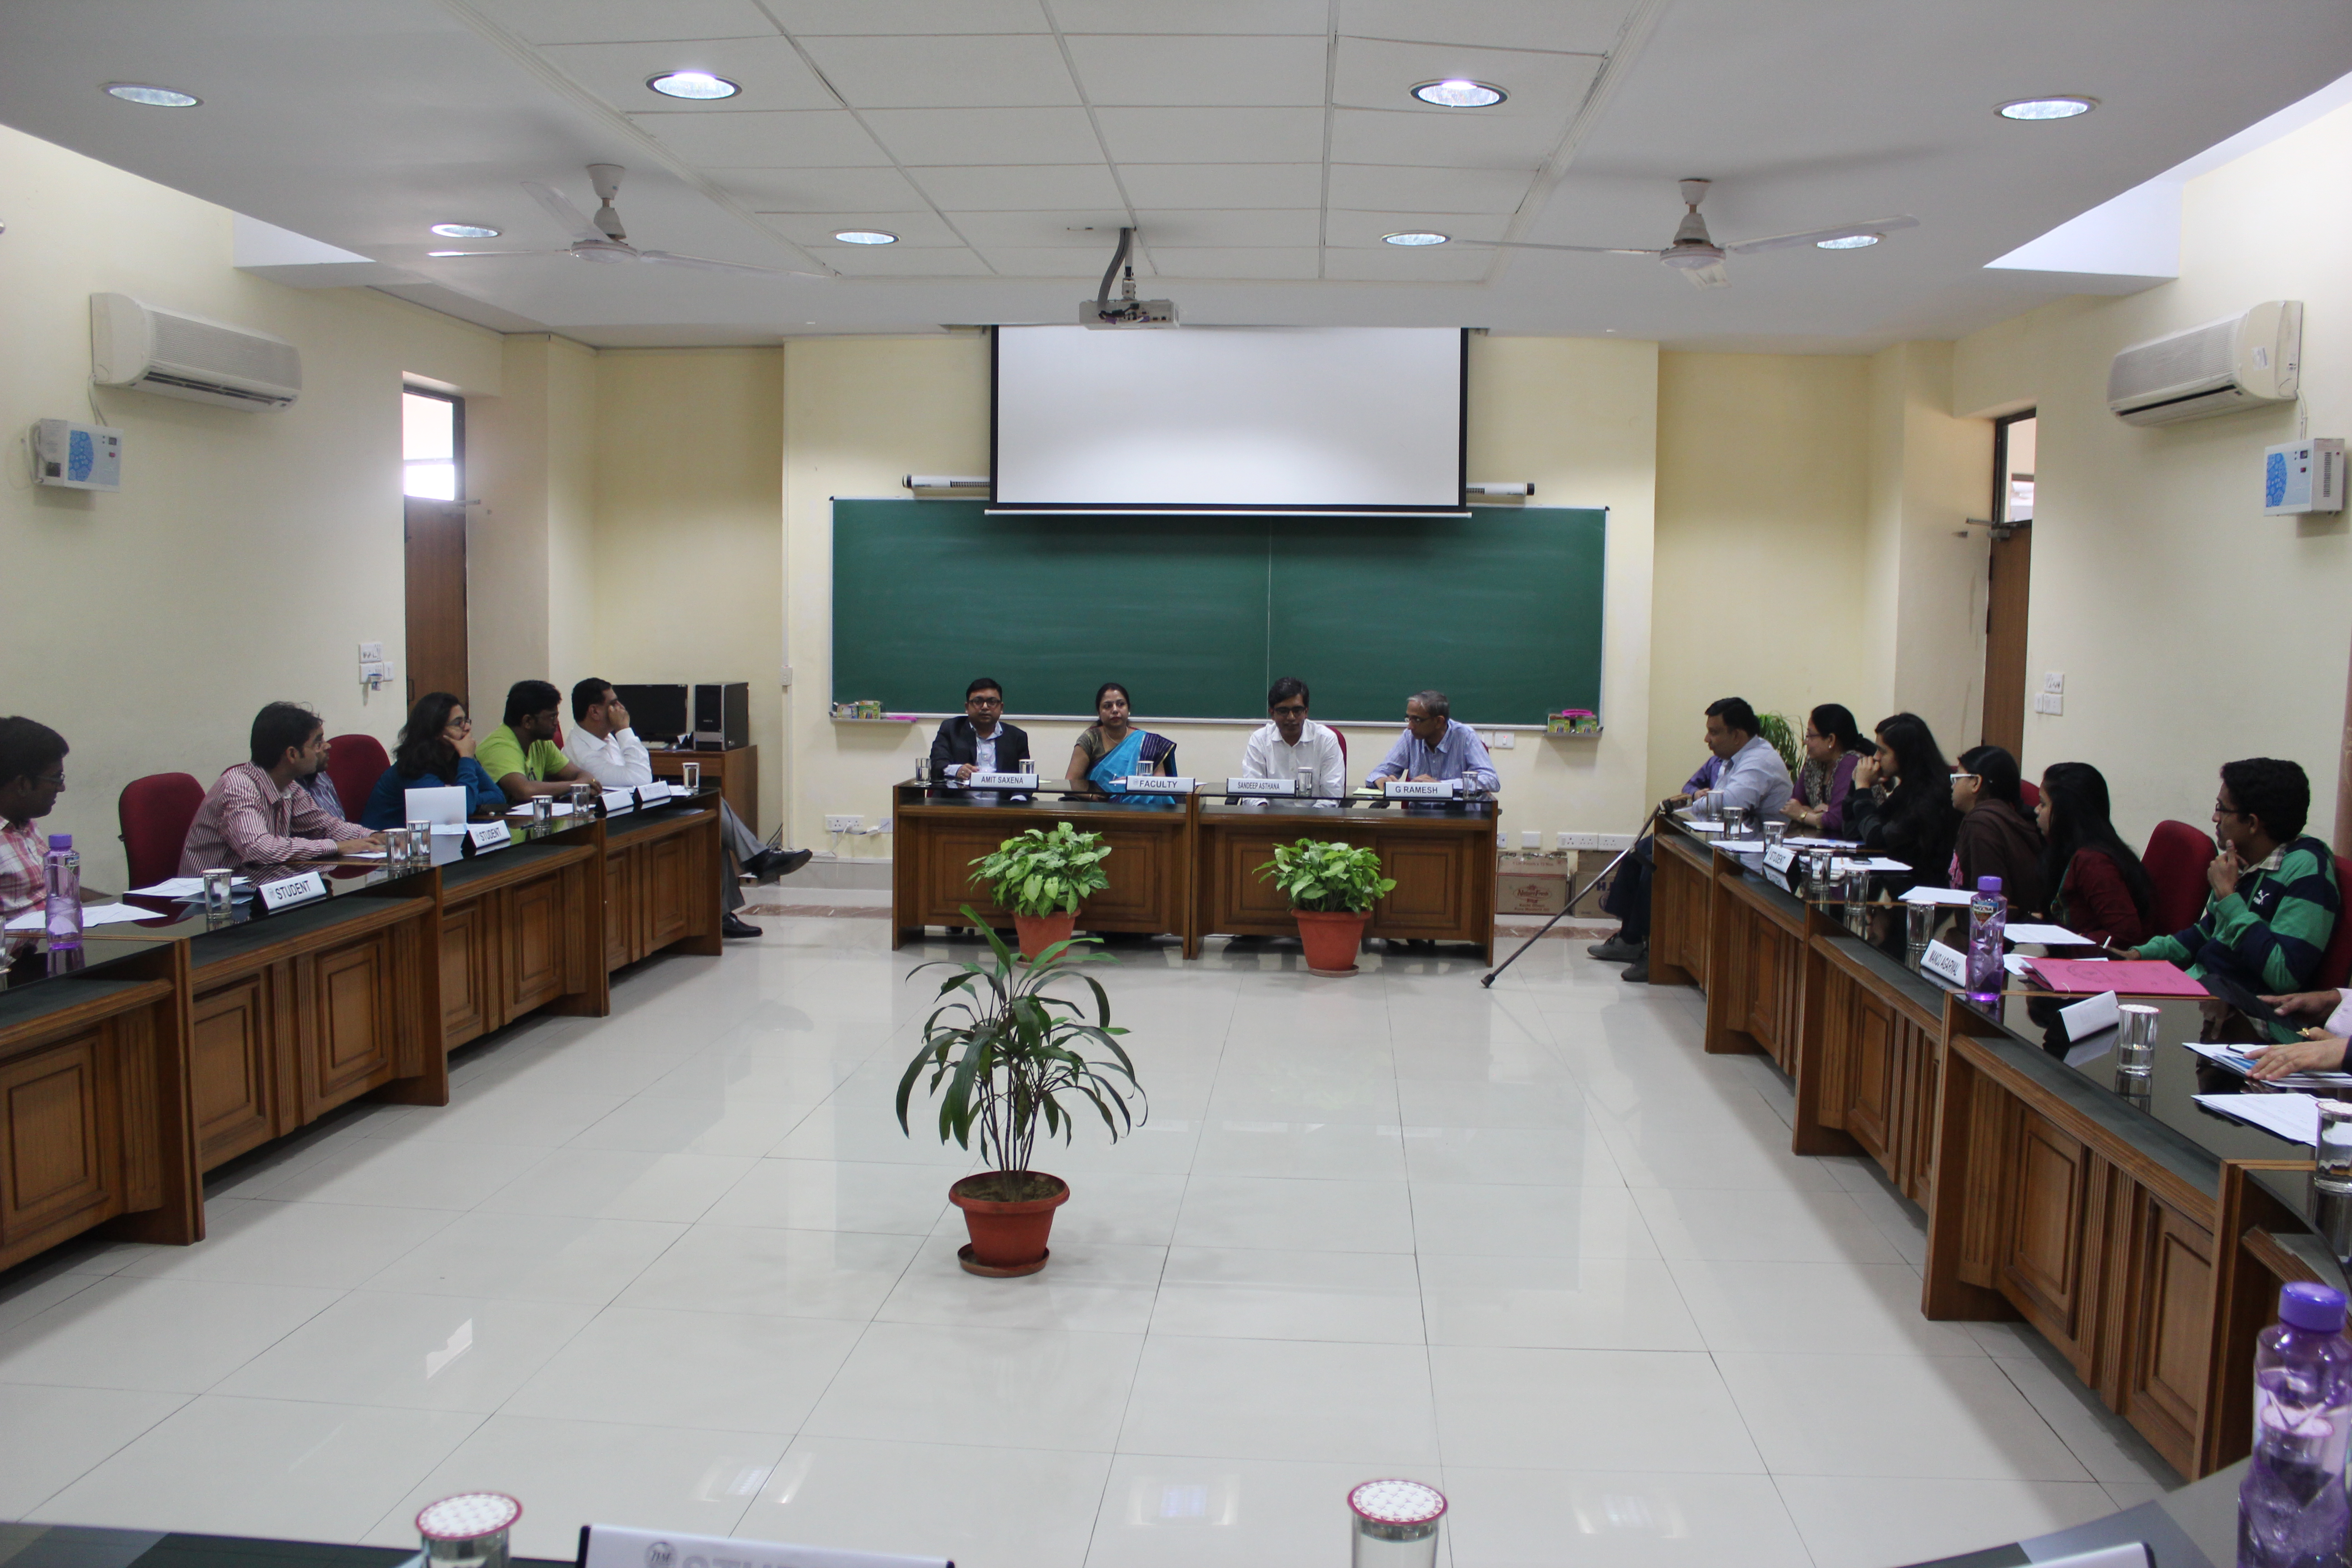 Conclave_2014_IIM Lucknow_2